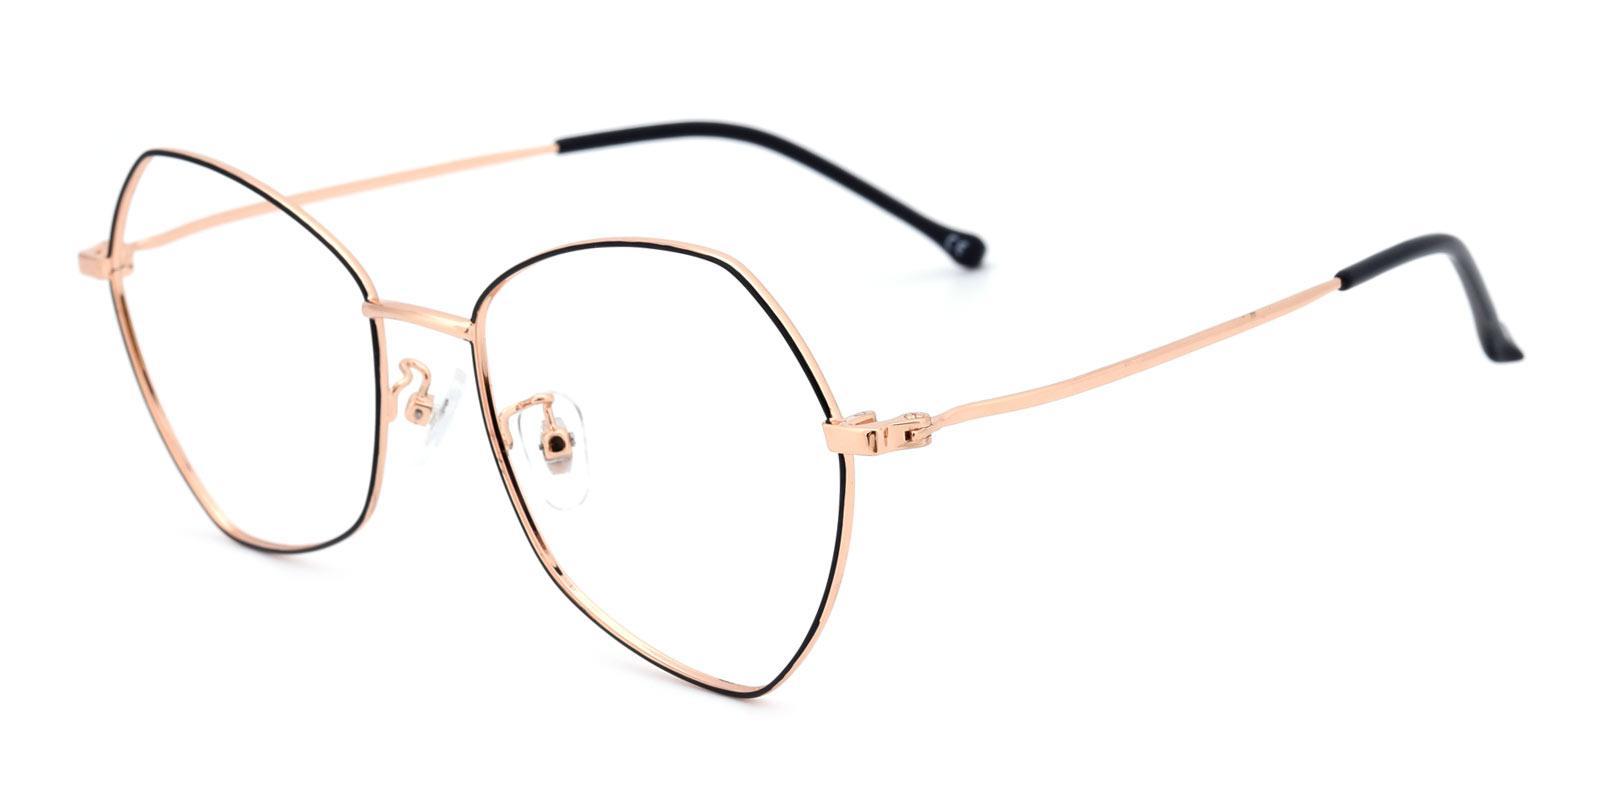 Control-Black-Geometric-Metal-Eyeglasses-detail